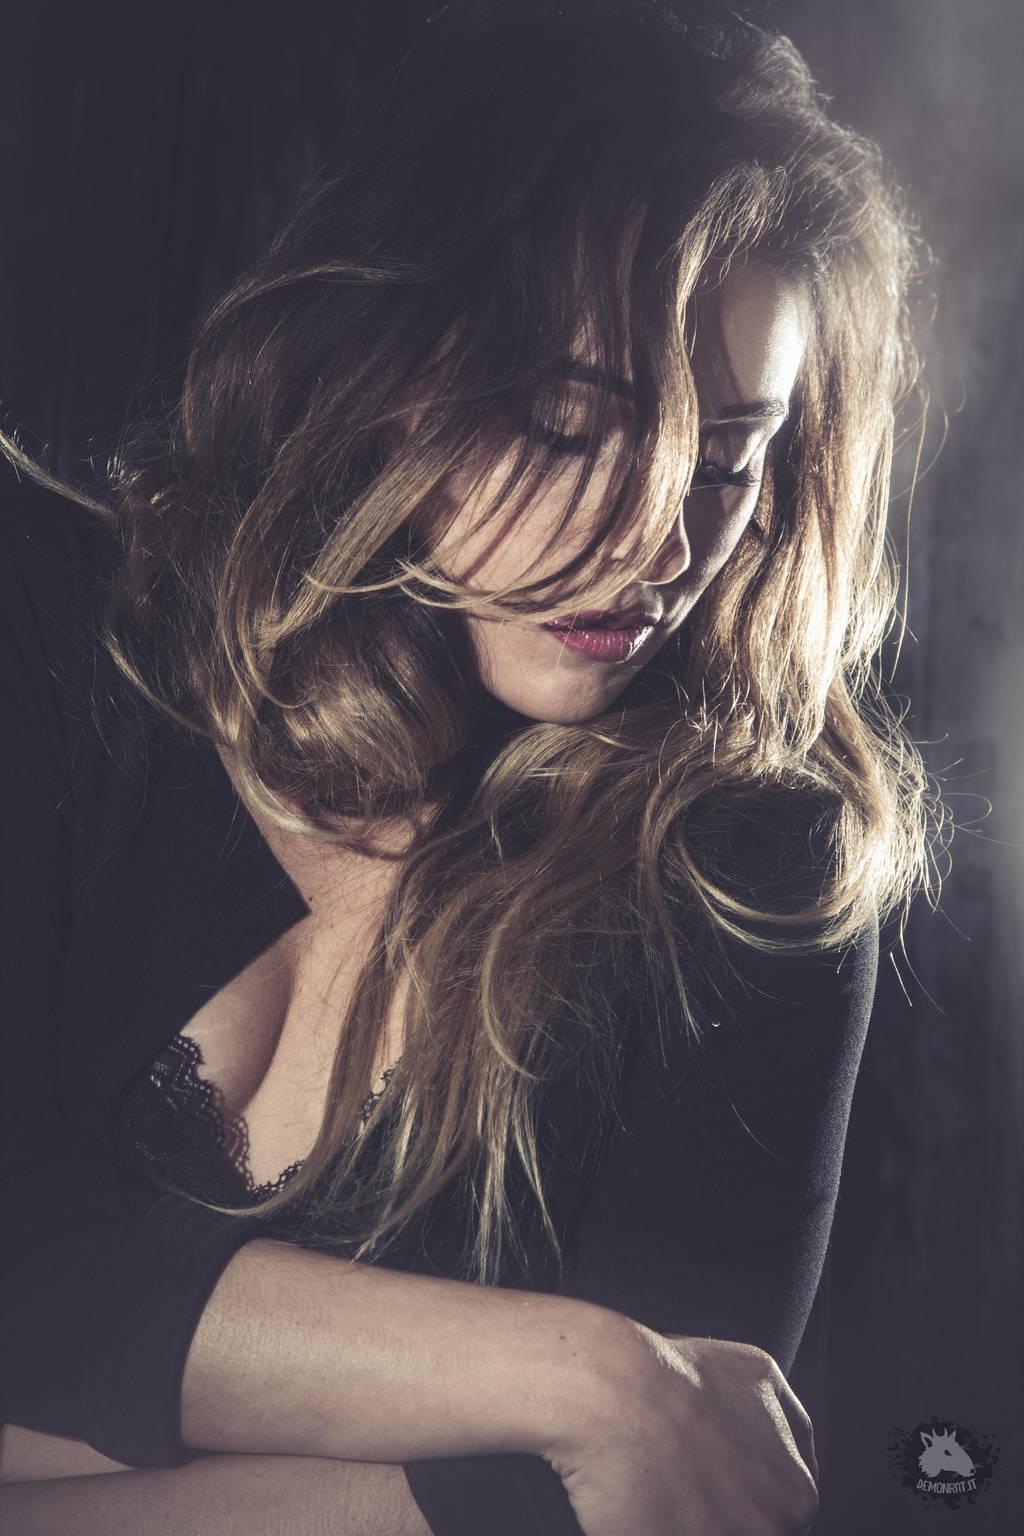 Like a model by Demonrat